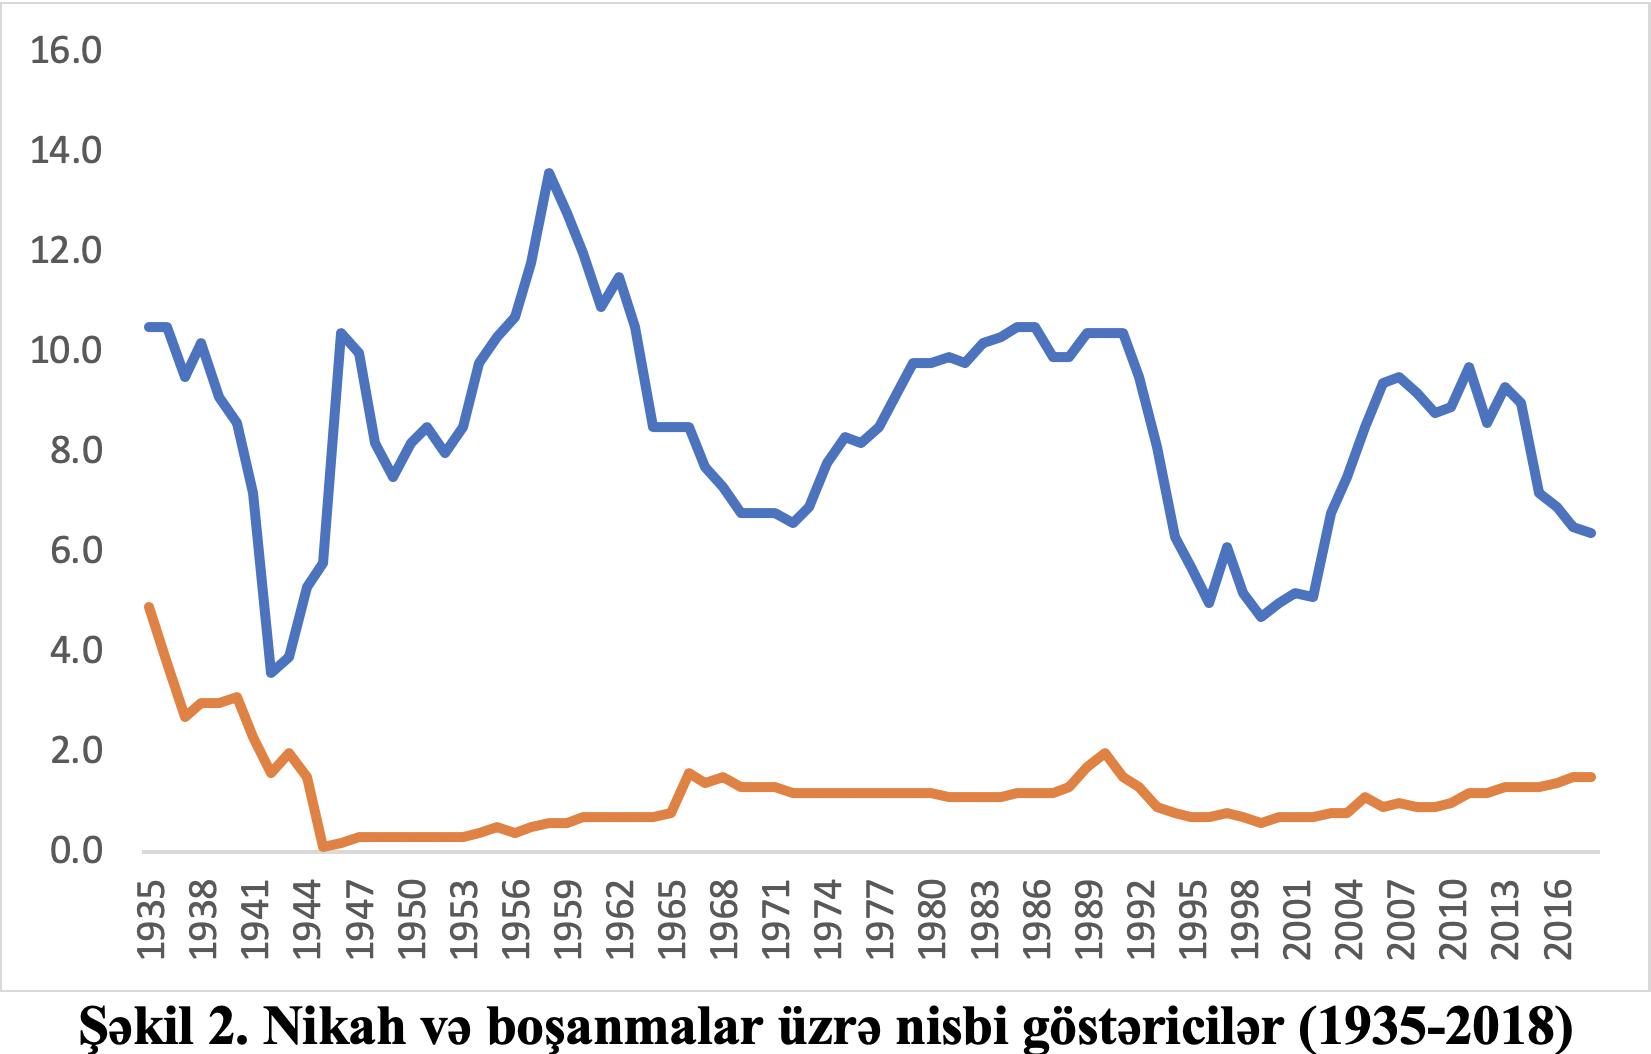 Statistika və təəssürat